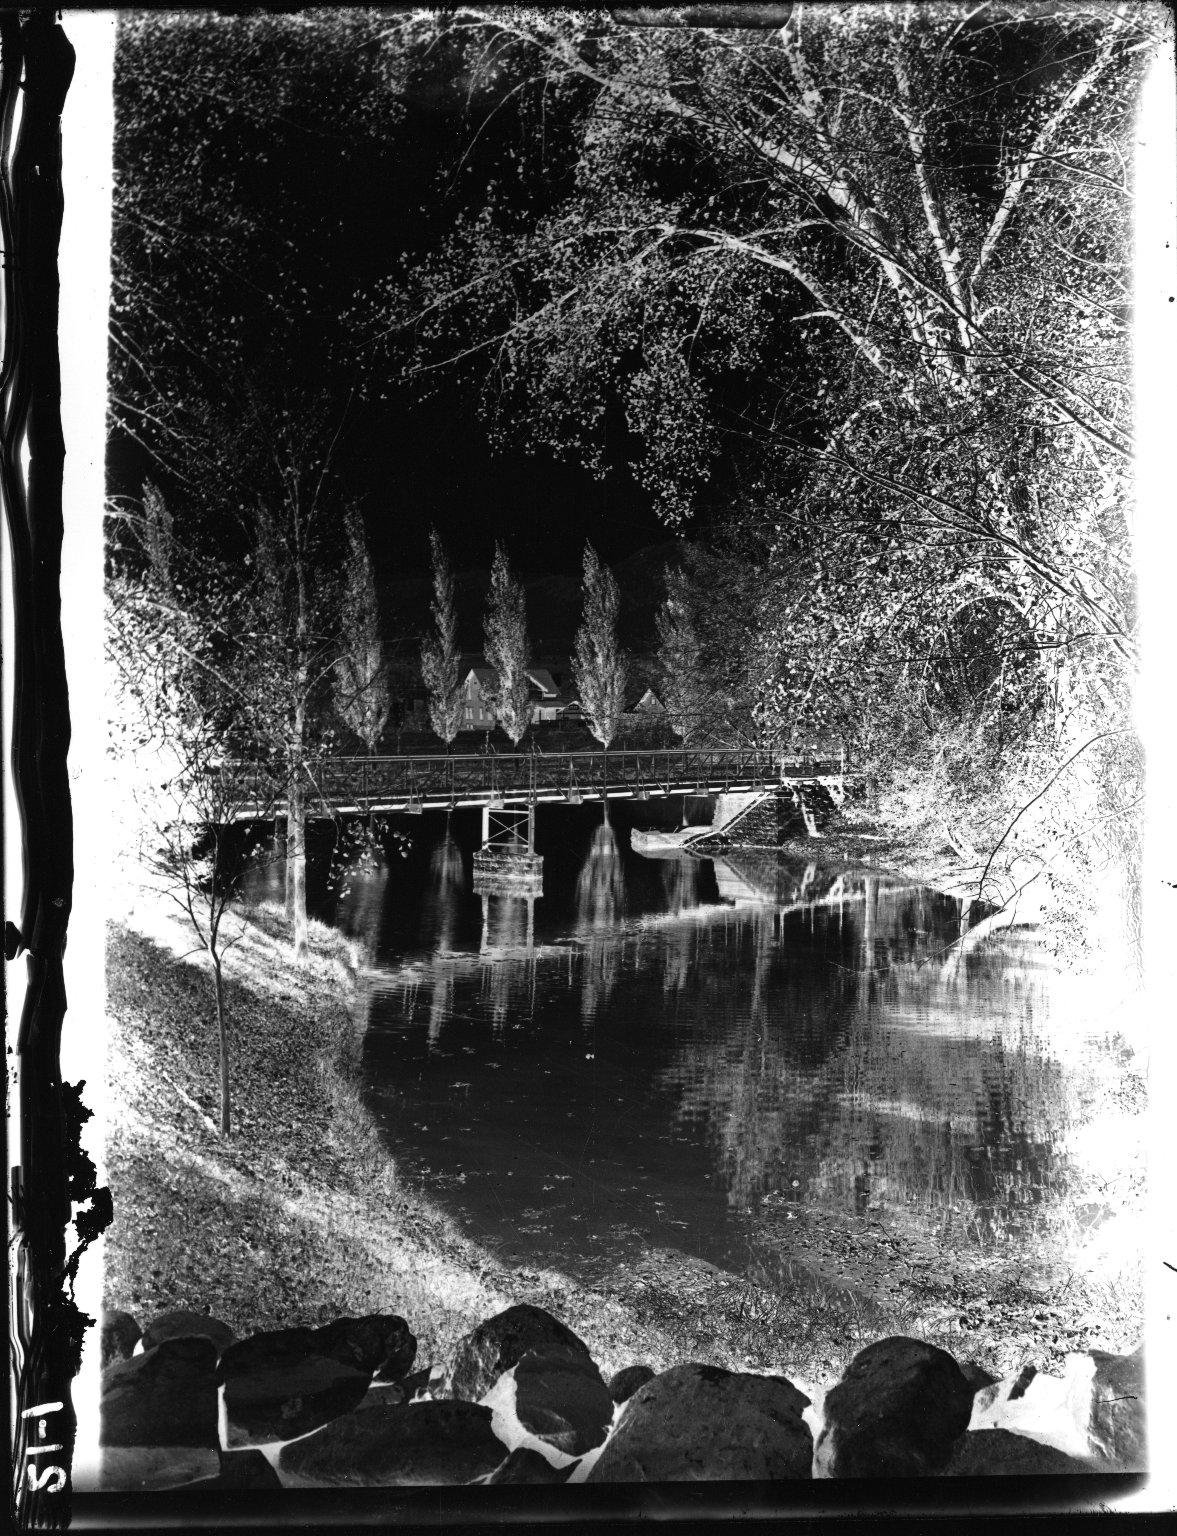 [Bridge over Varsity Lake]